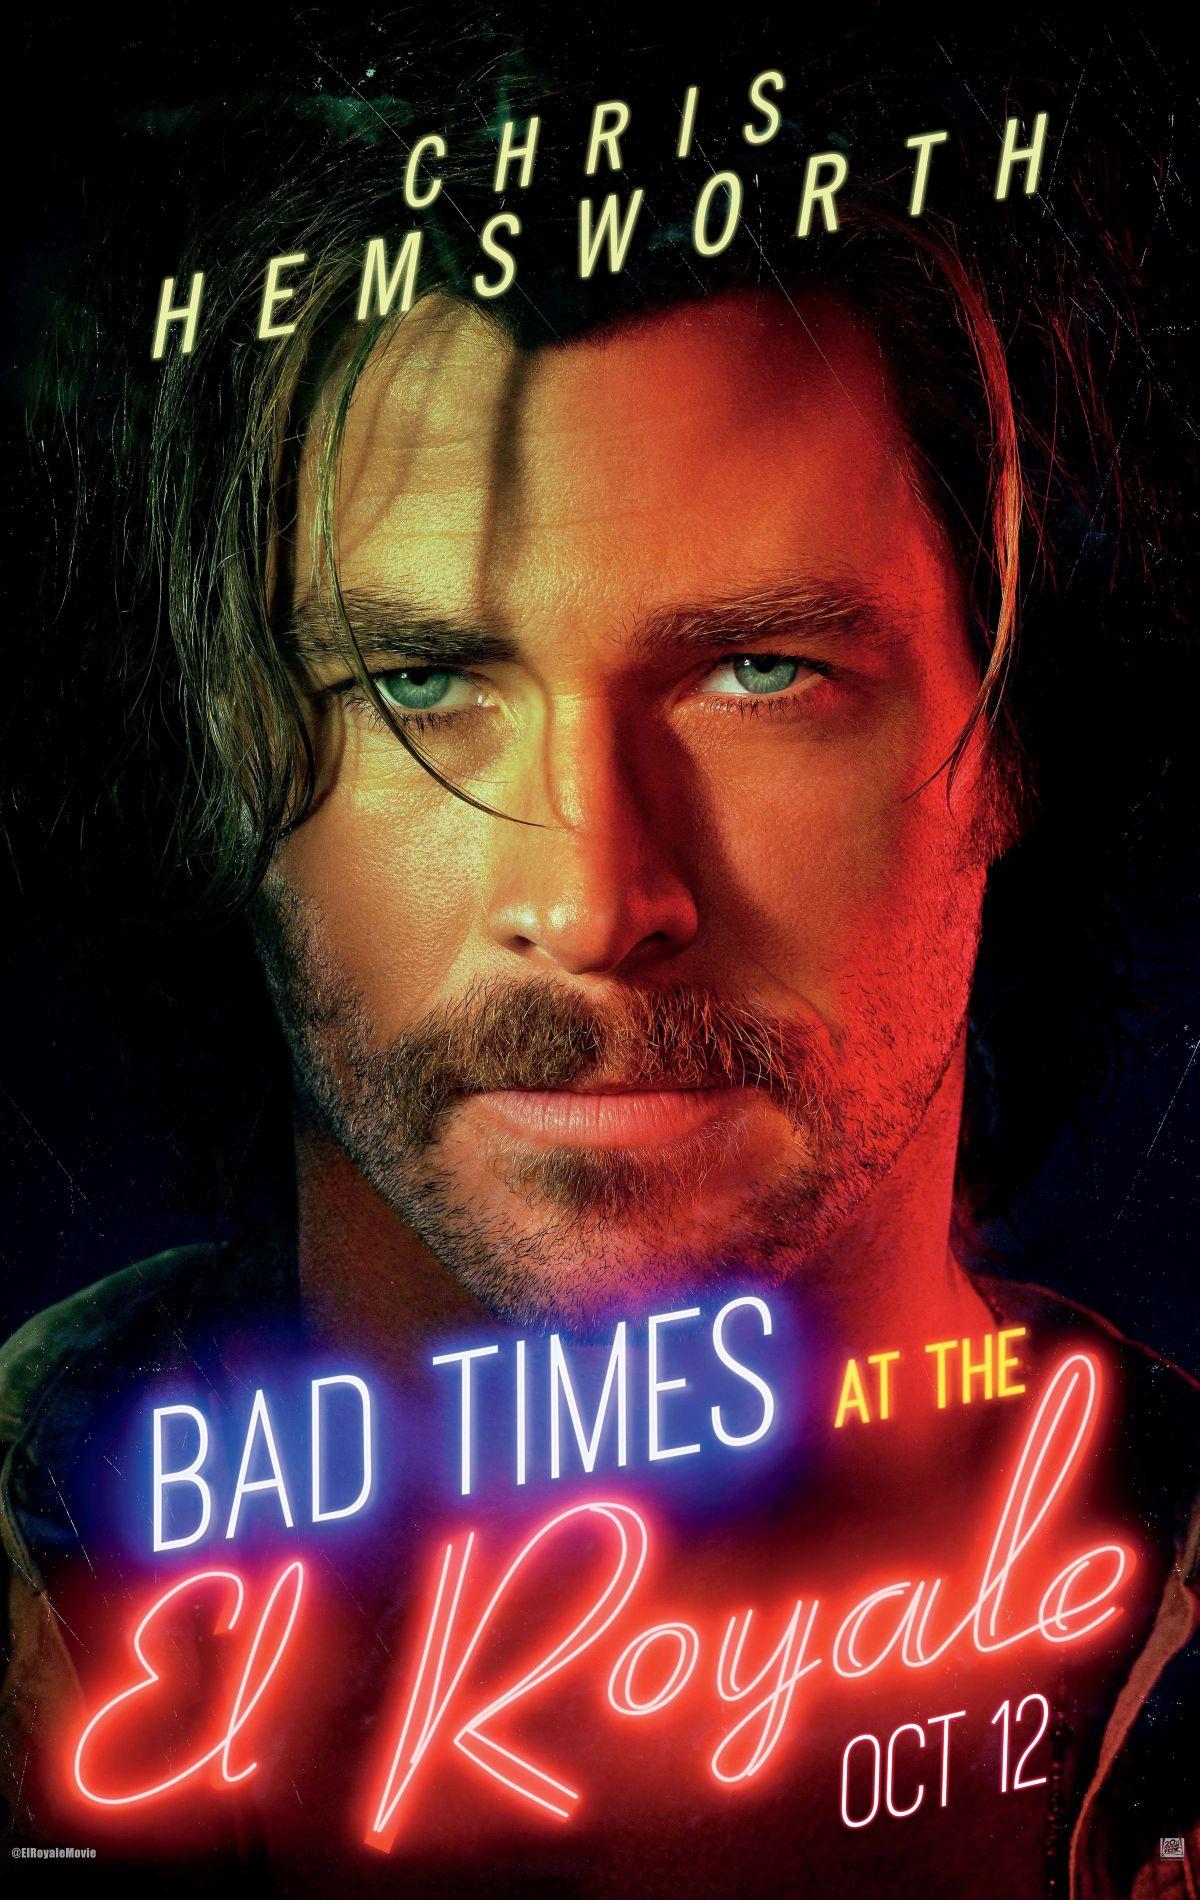 7 Sconosciuti a El Royale: il character poster di Chris Hemsworth